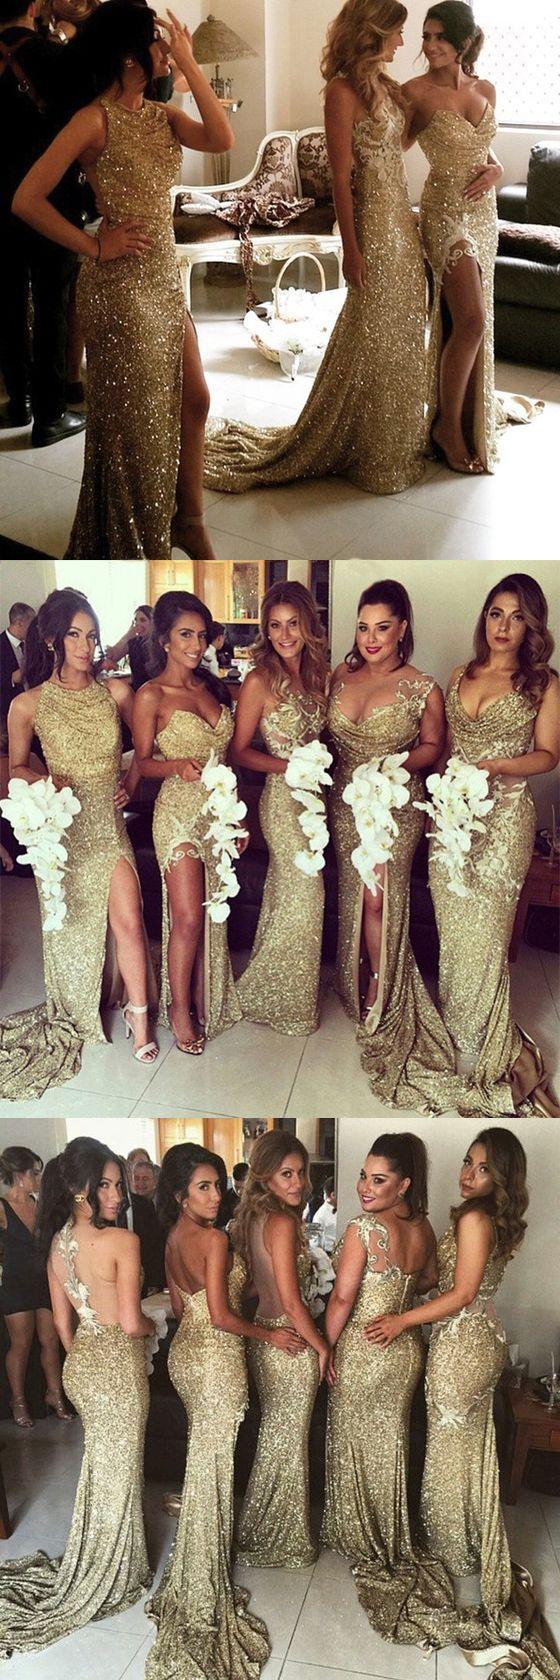 Sequin bridesmaid dresses long mismatched bridesmaid dresses sequin bridesmaid dresses long mismatched bridesmaid dresses sexy gorgeous bridesmaid dresses sparkly wedding ombrellifo Choice Image